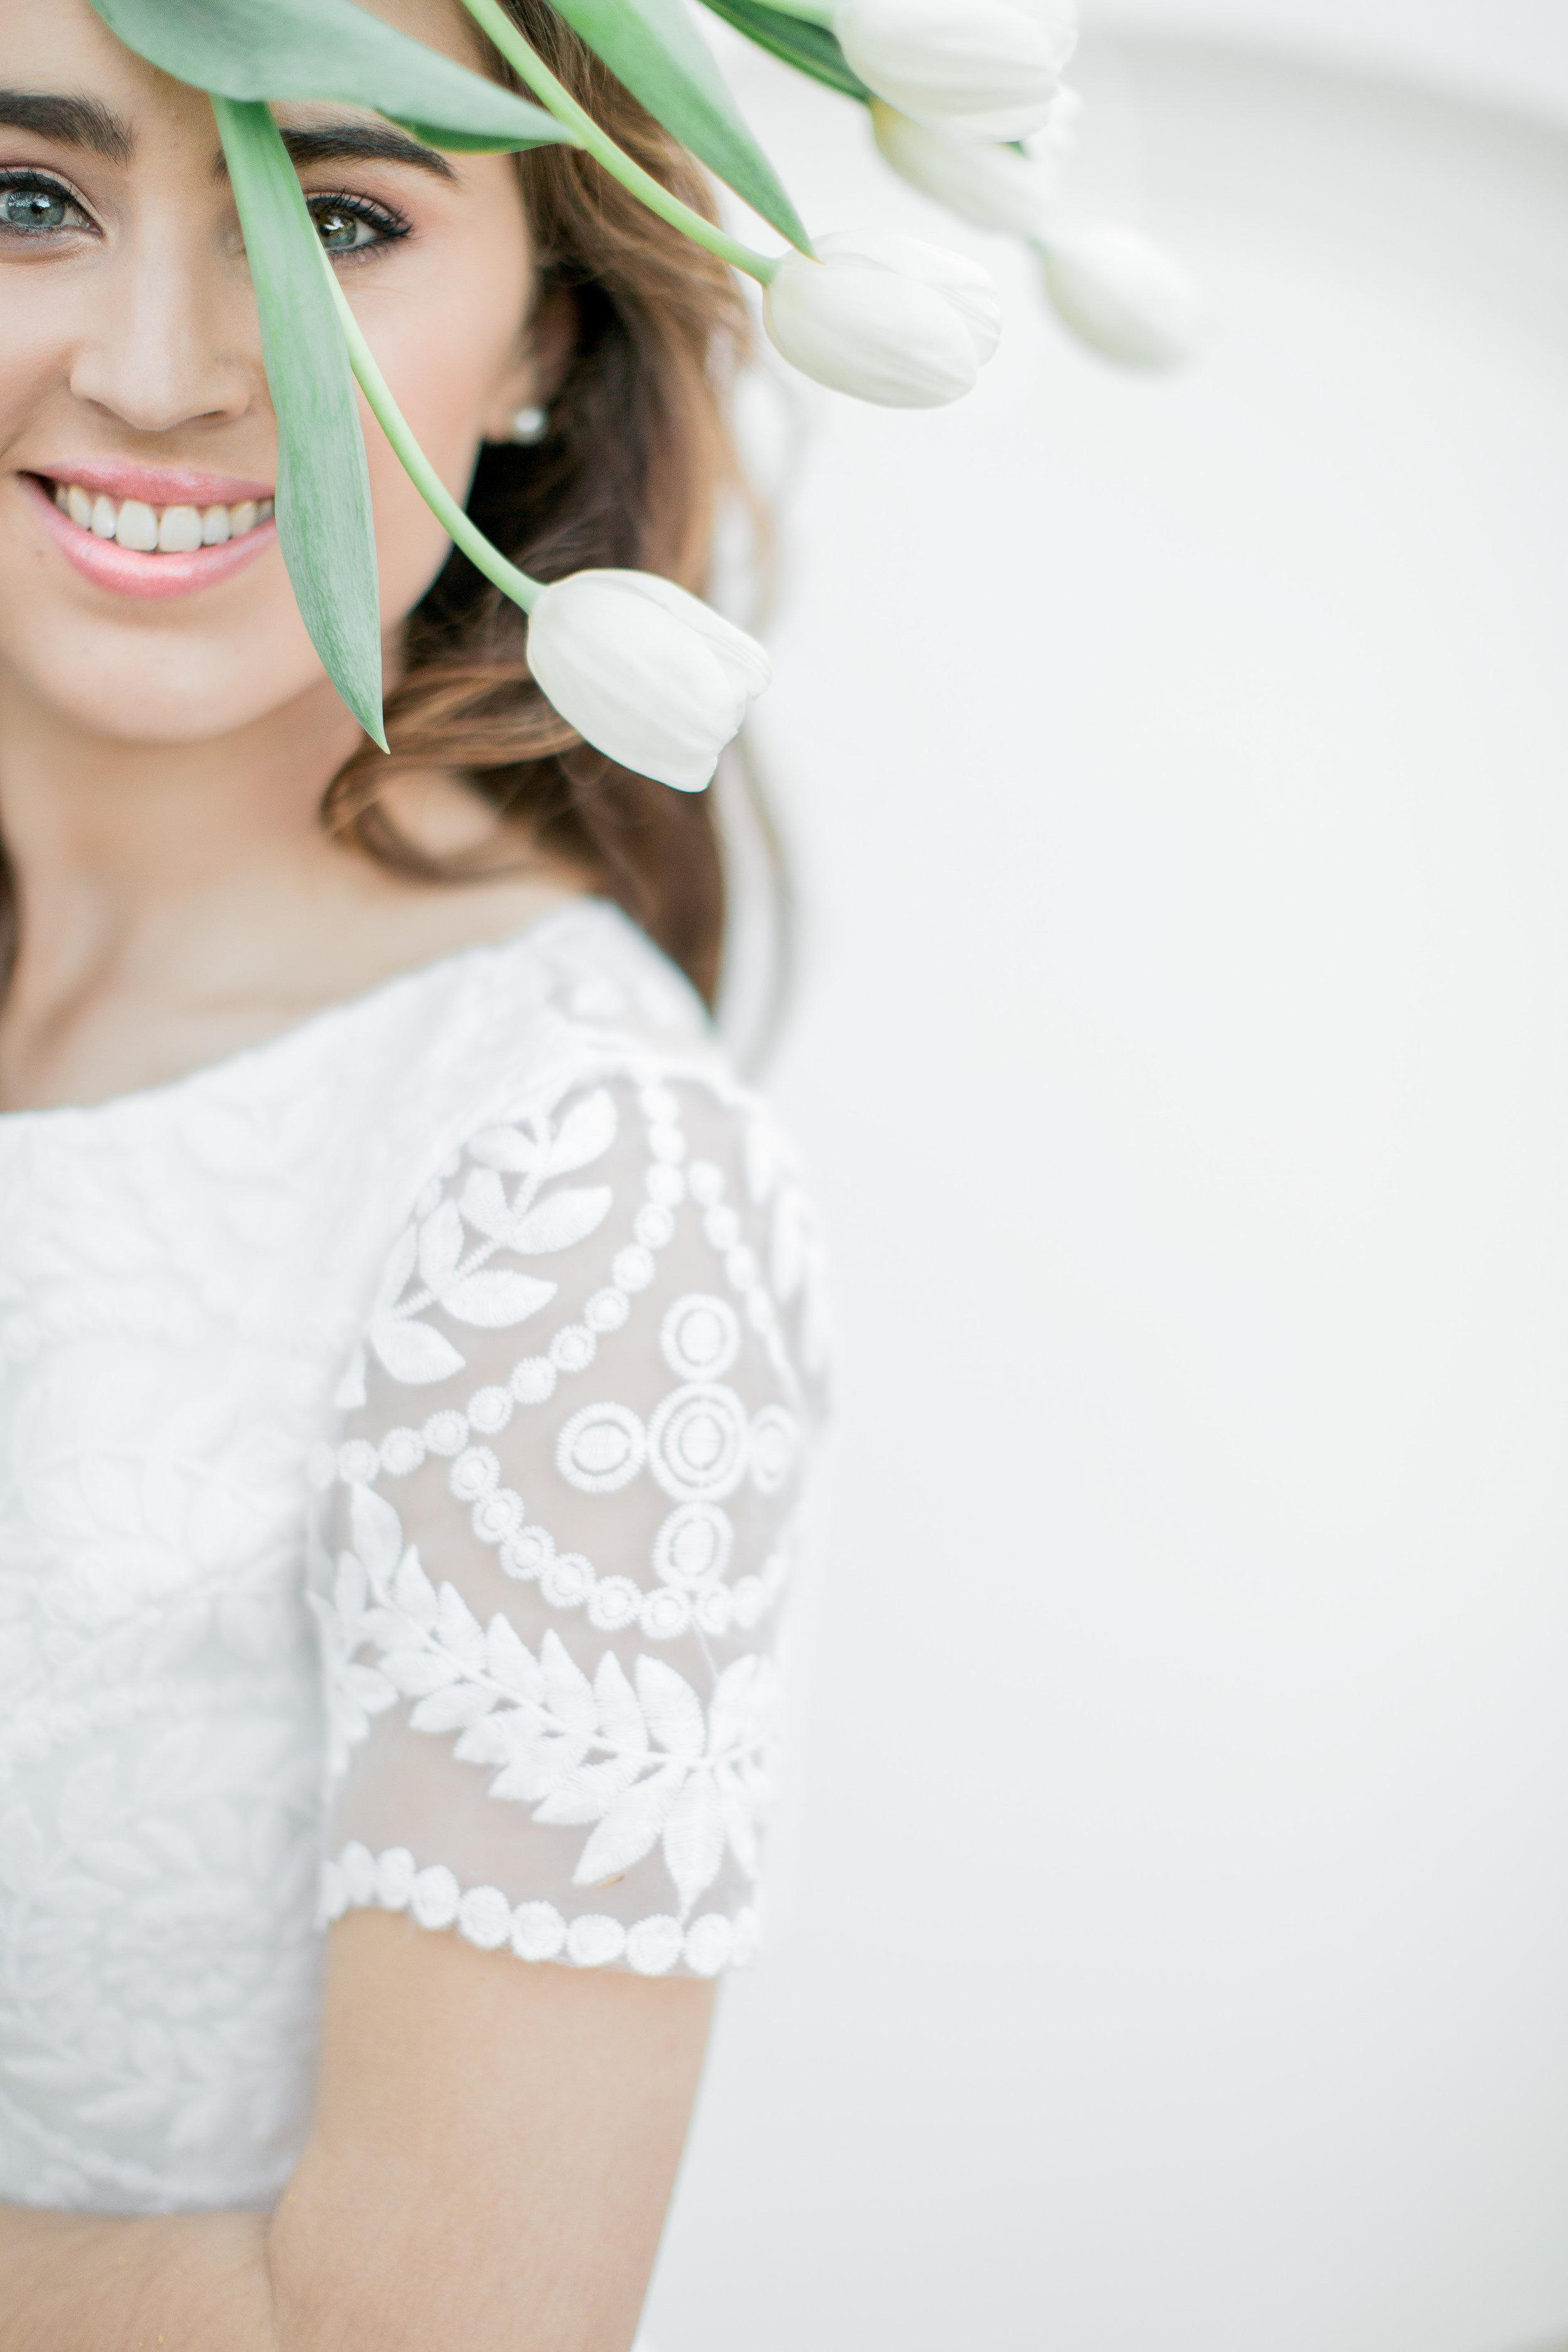 gauteng wedding photographer clareece smit34.jpg